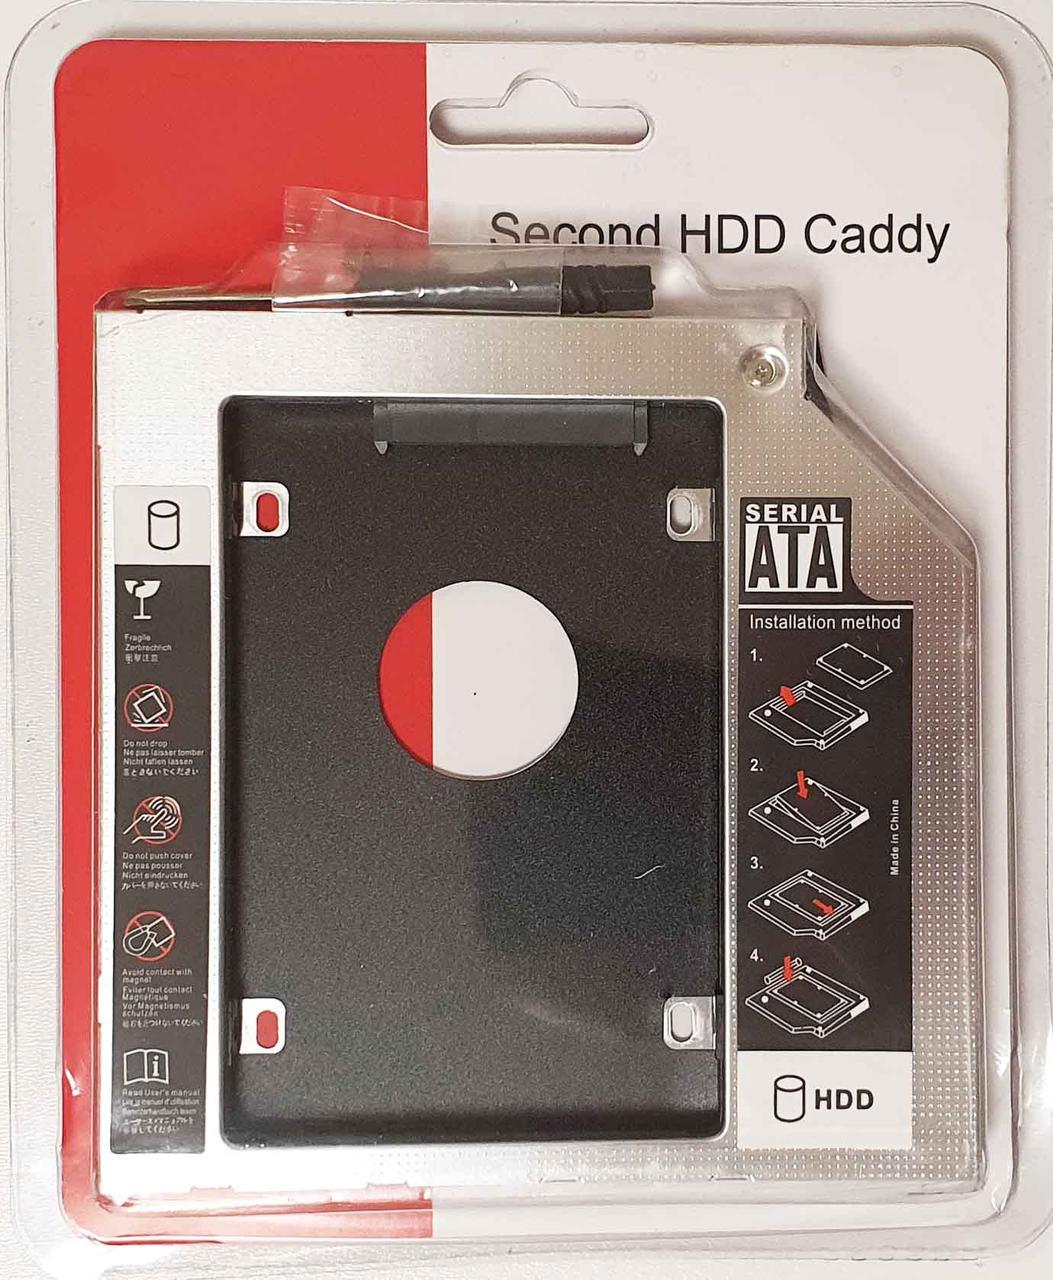 50 шт. Карман для установки второго жесткого диска SATA в отсек DVD 12.7 мм SATA (optibay caddy) алюминий